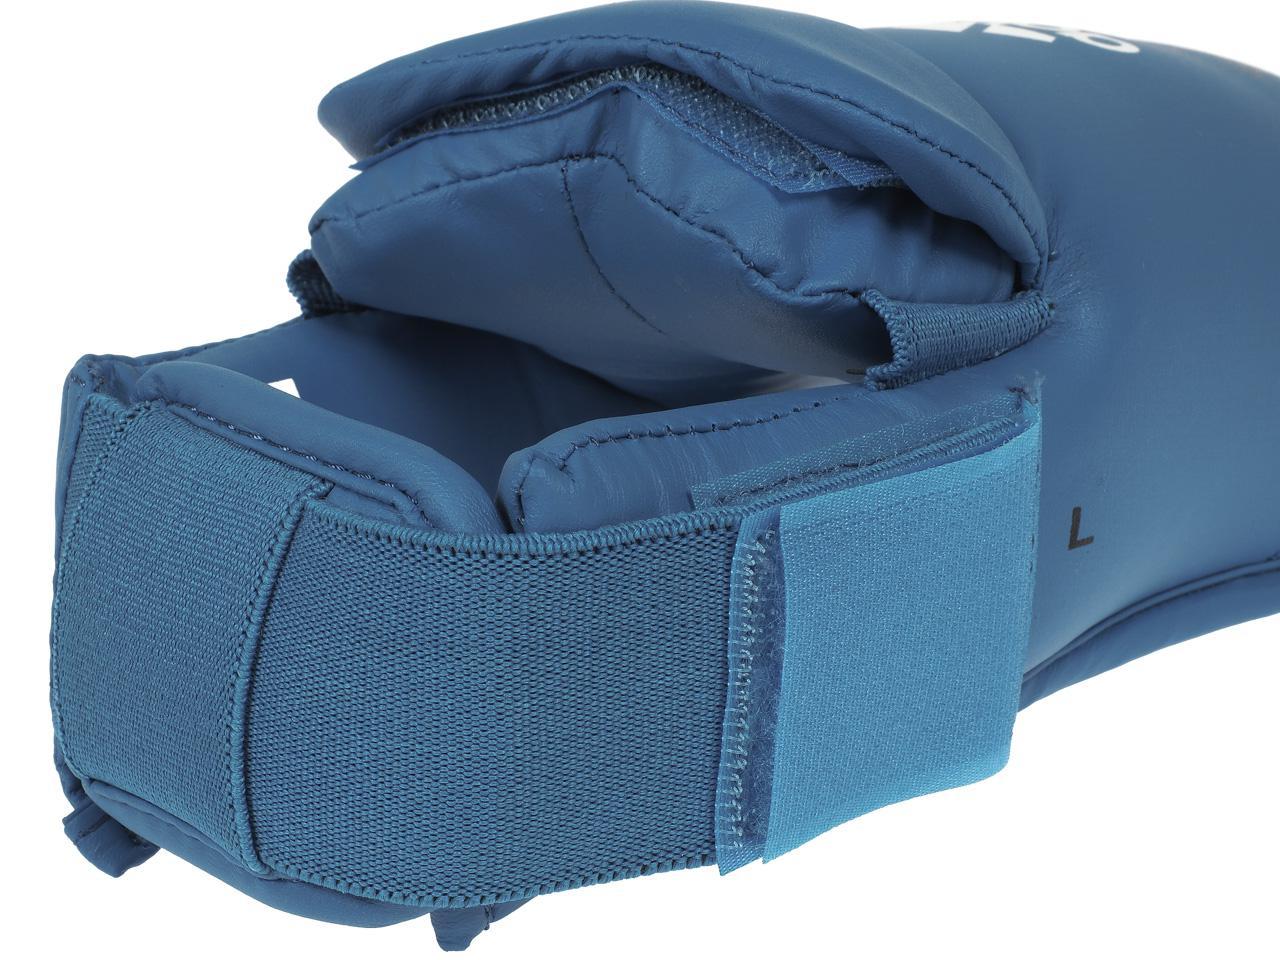 Protects-Feet-Karate-Adidas-Protege-Feet-Blue-Karate-Blue-58599-New thumbnail 3